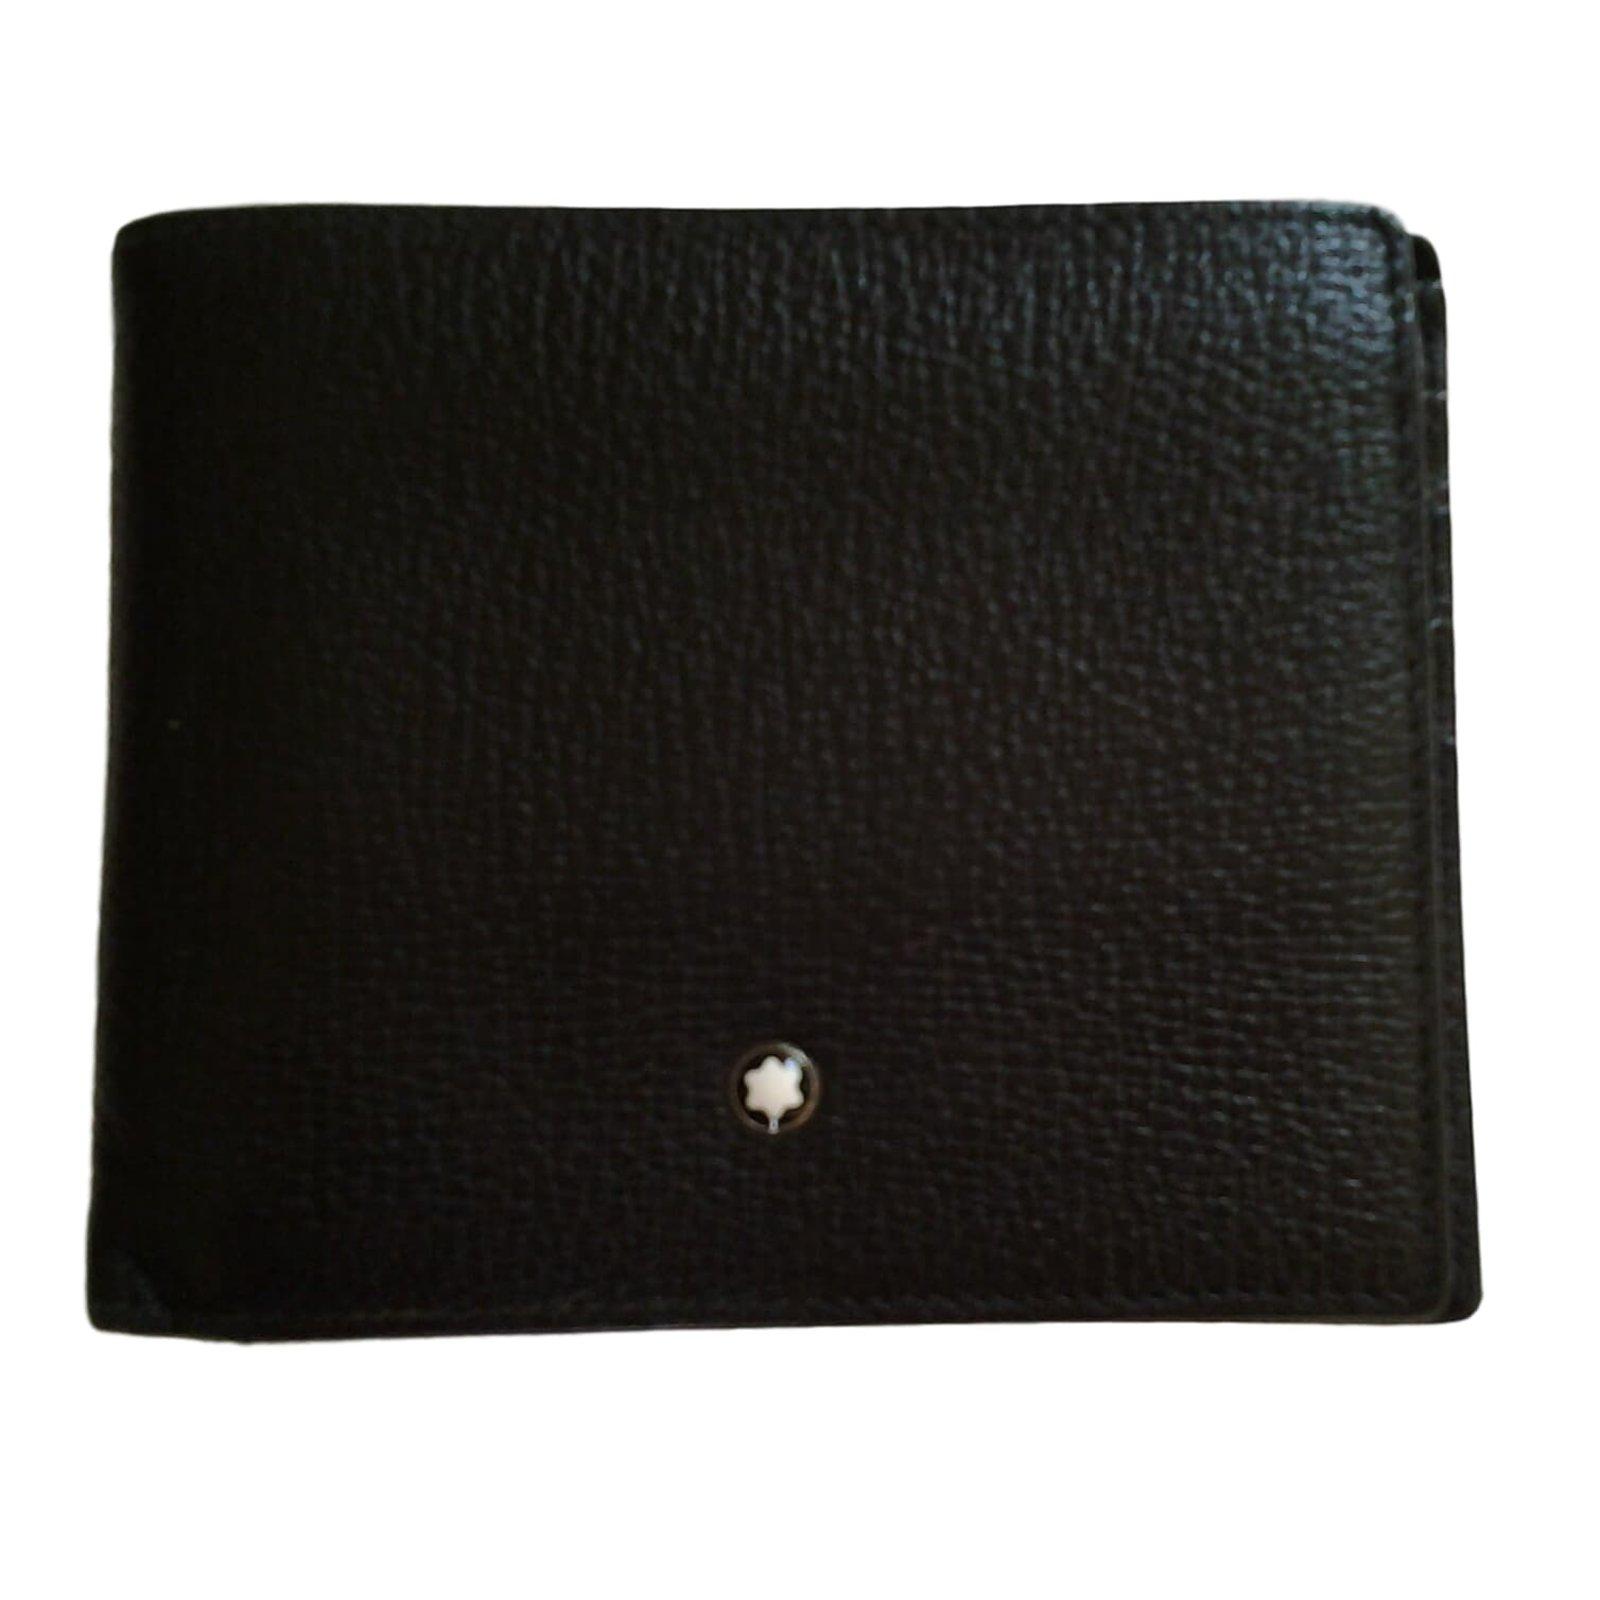 Portefeuille MONTBLANC cuir noir ikLXACJ1